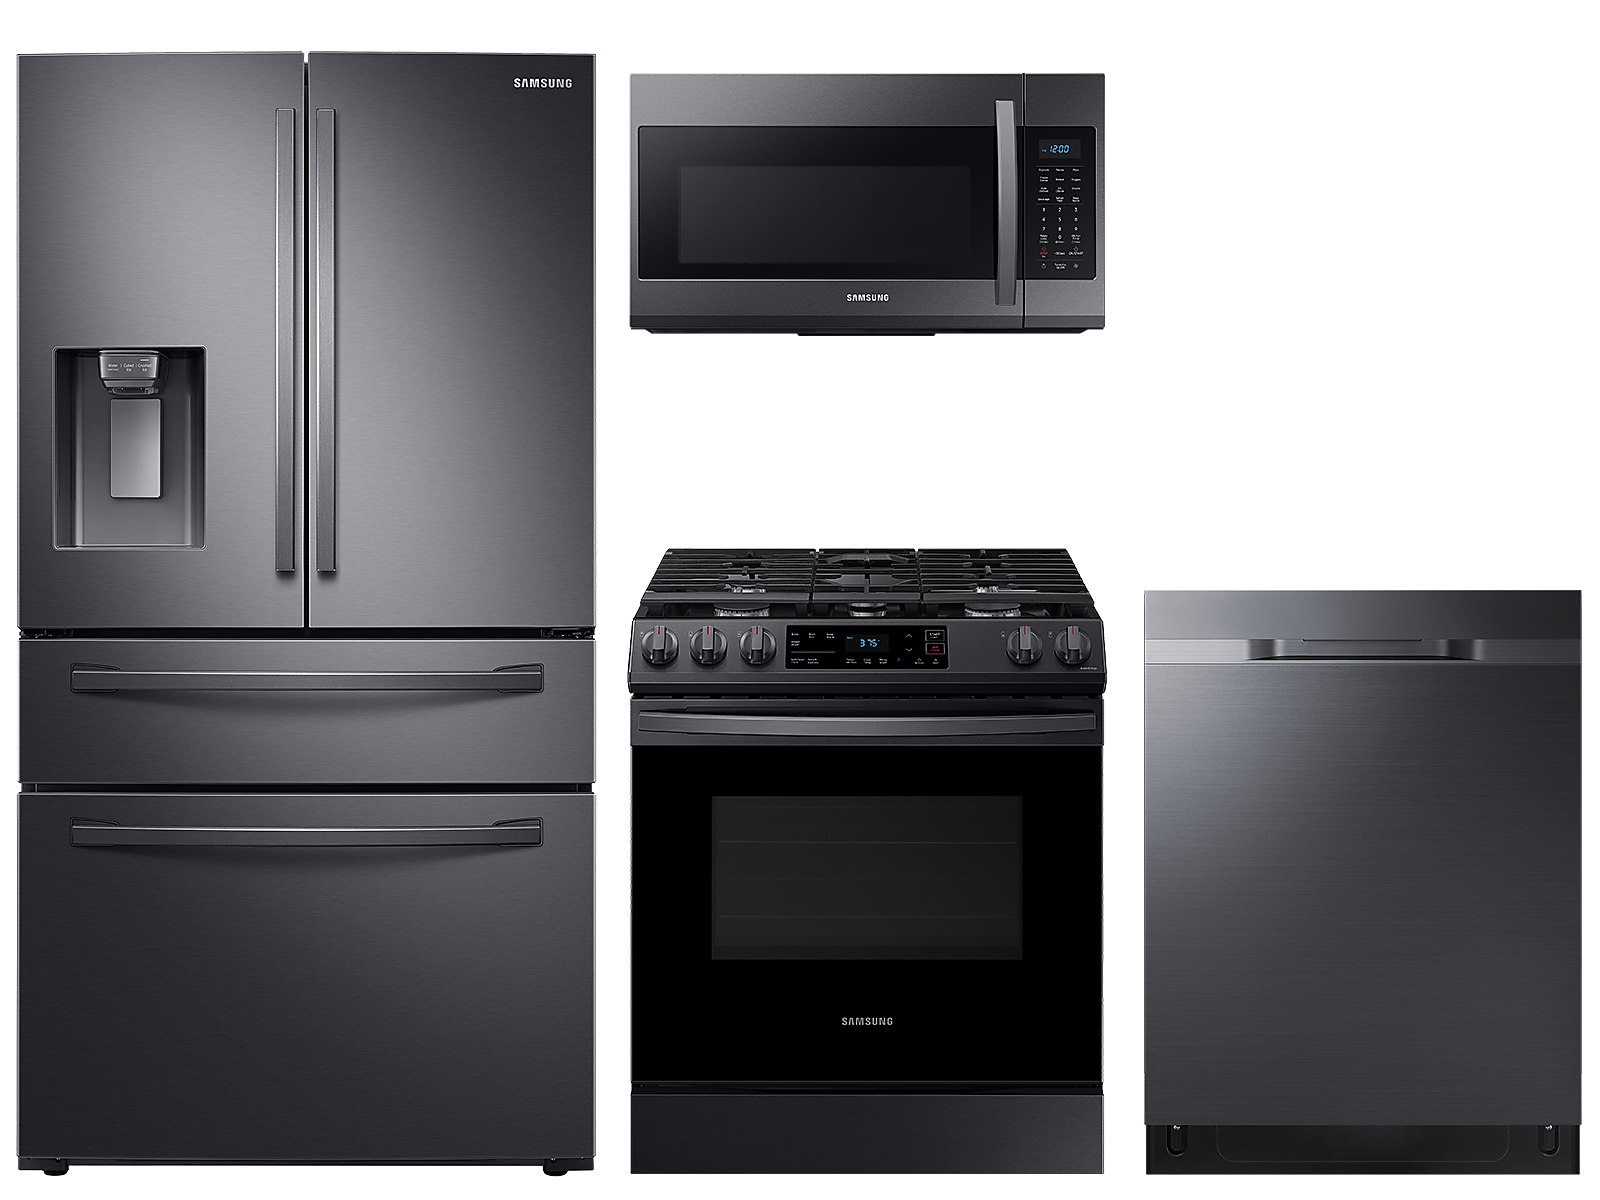 Samsung coupon: Samsung 23 cu. ft. counter depth 4-door refrigerator, gas range, microwave and 48 dBA dishwasher package(BNDL-1614028040810)